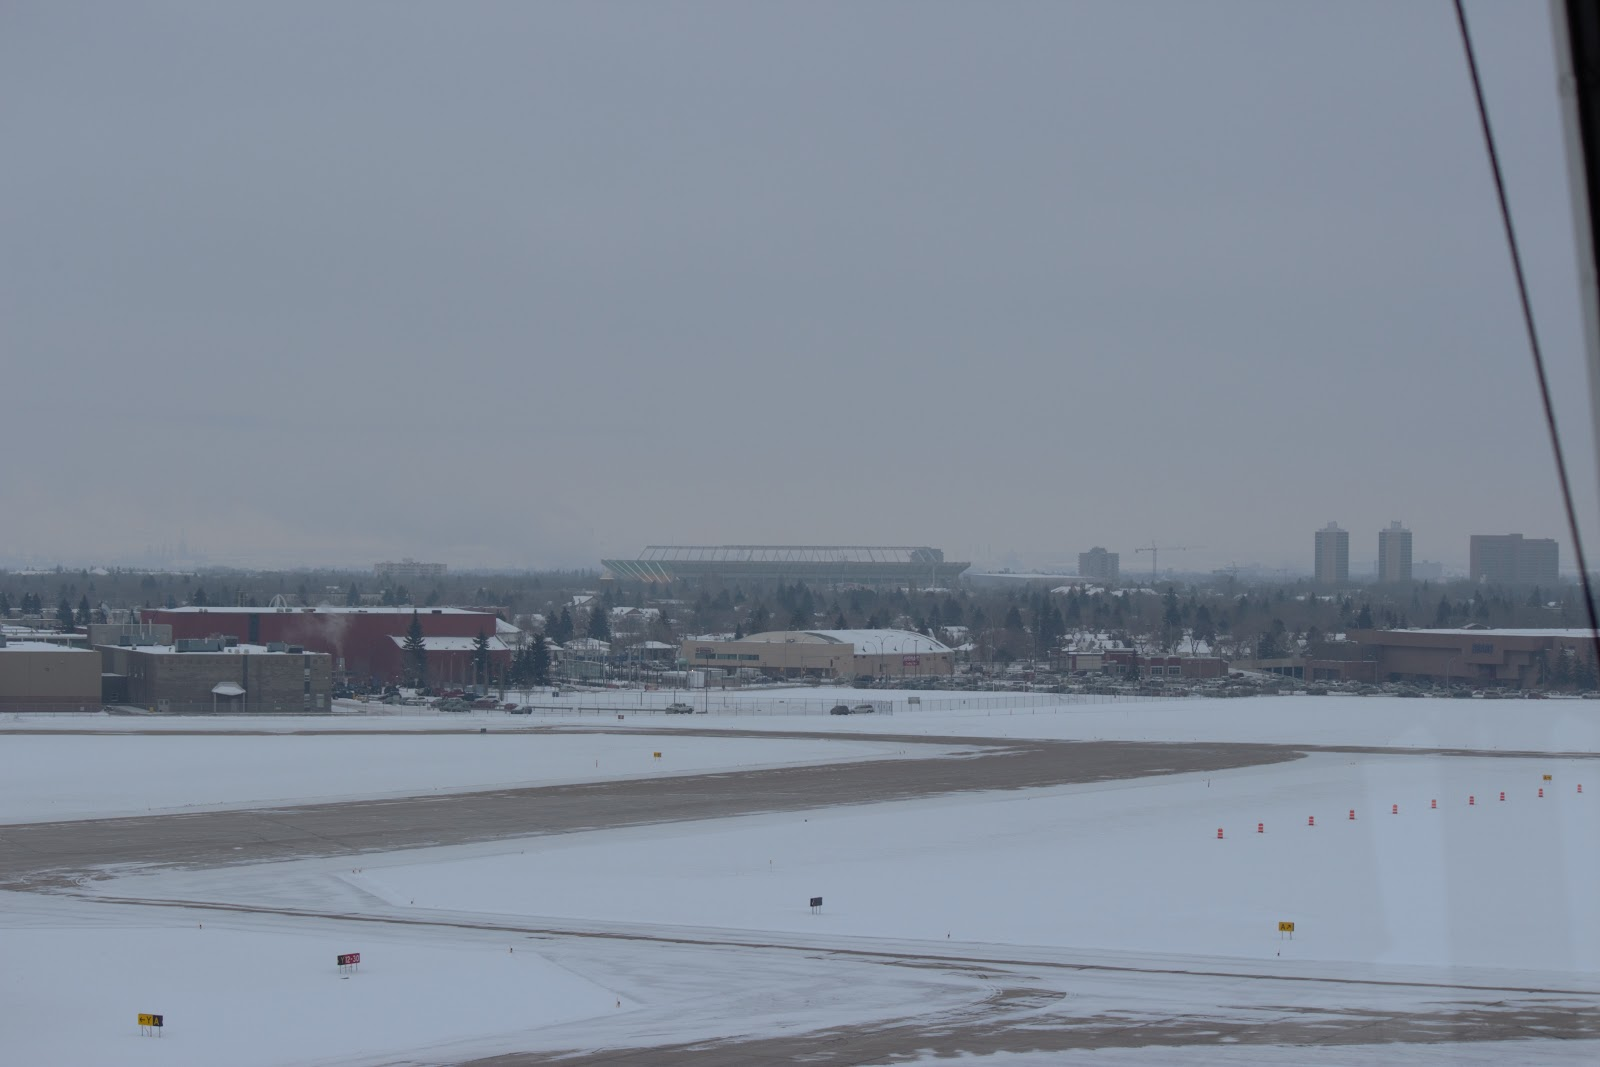 Blue apron edmonton - Commonwealth Stadium Southeast Of Edmonton City Centre Airport Taken From Edmonton City Centre Airport Control Tower R Bernshaw Photo